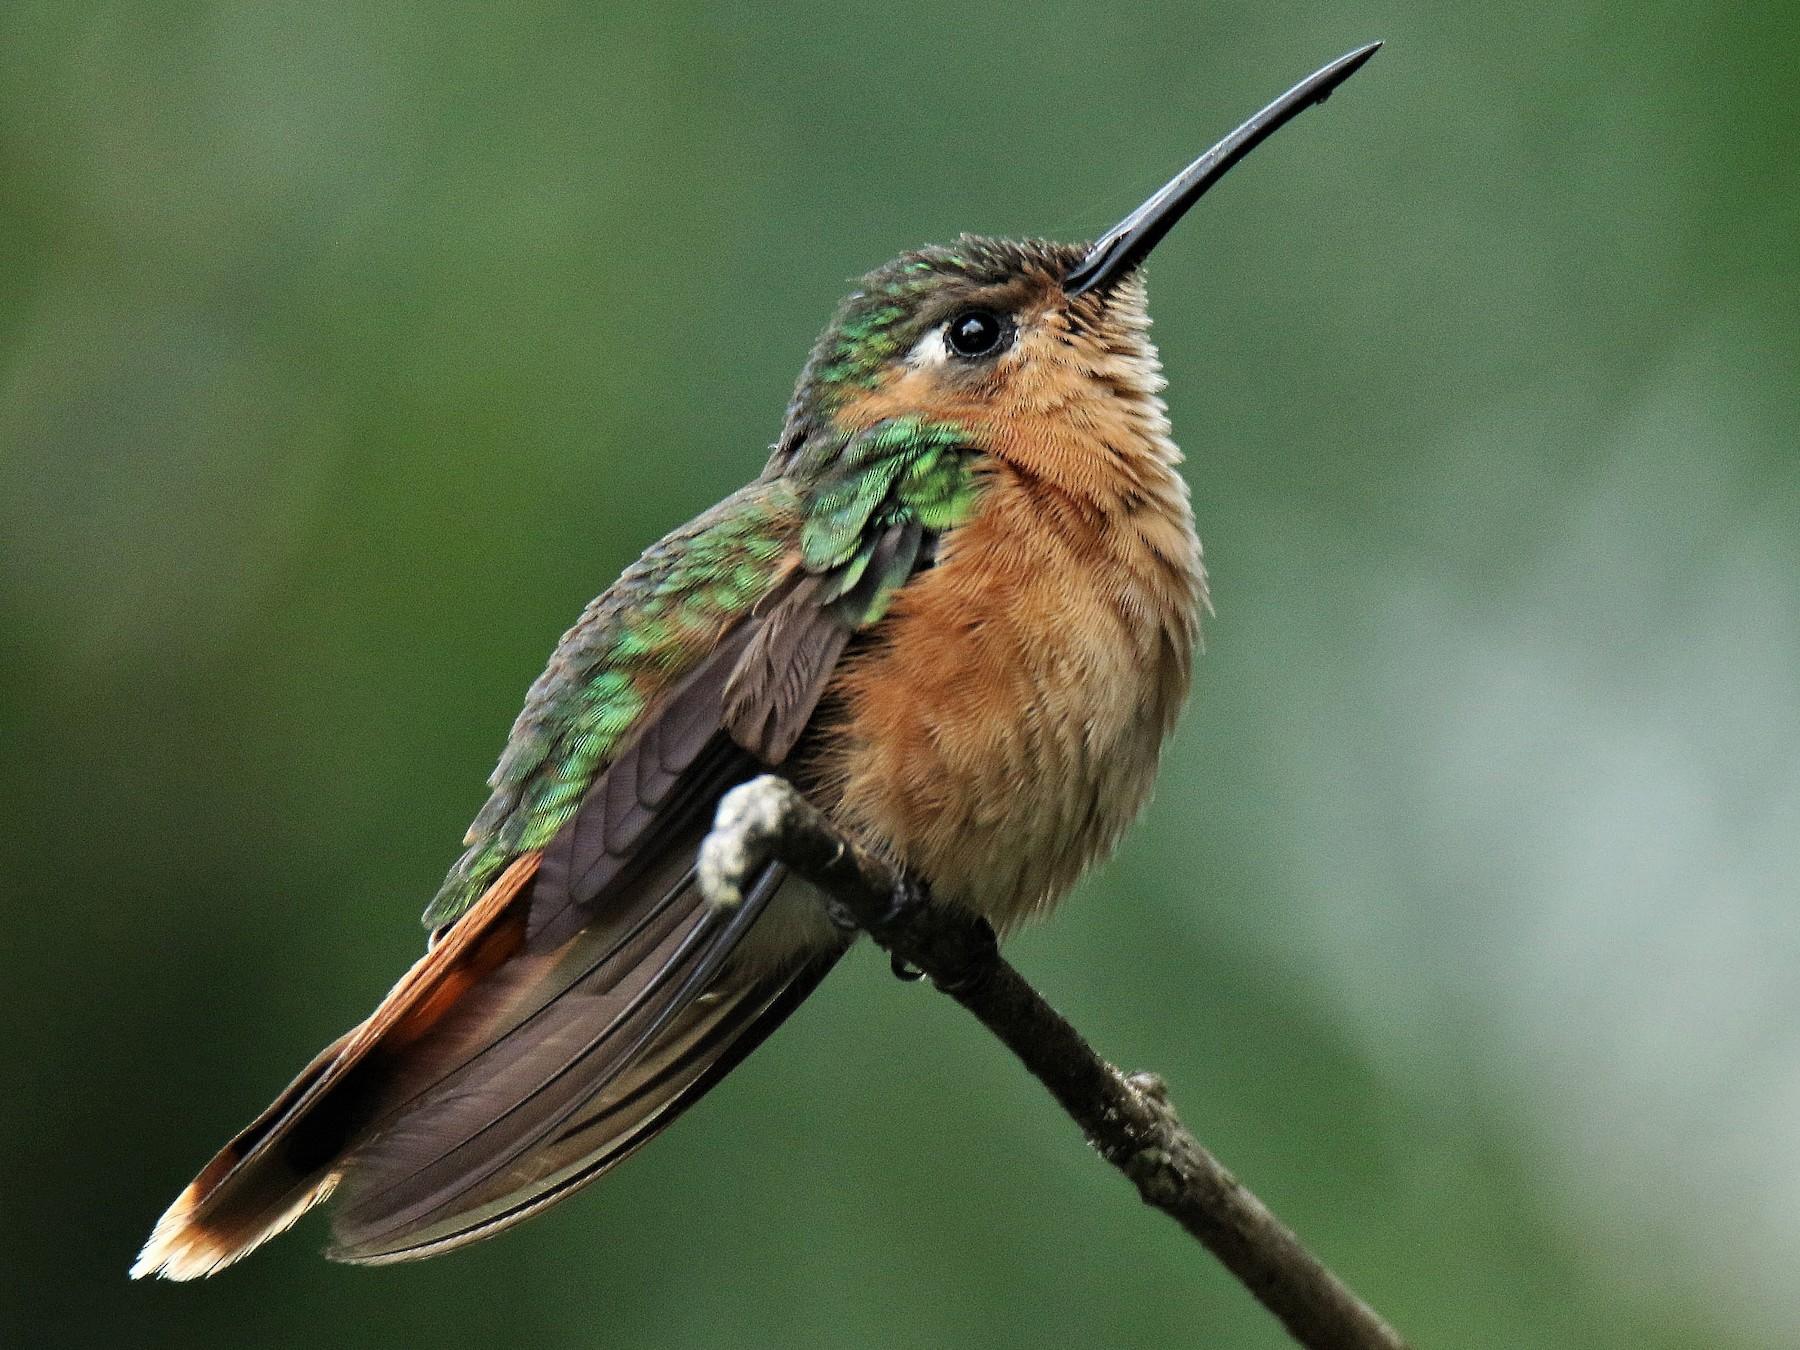 Rufous Sabrewing - Josue  de León Lux (Birding Guide) josuedeleonlux@gmail.com +502 3068 8988